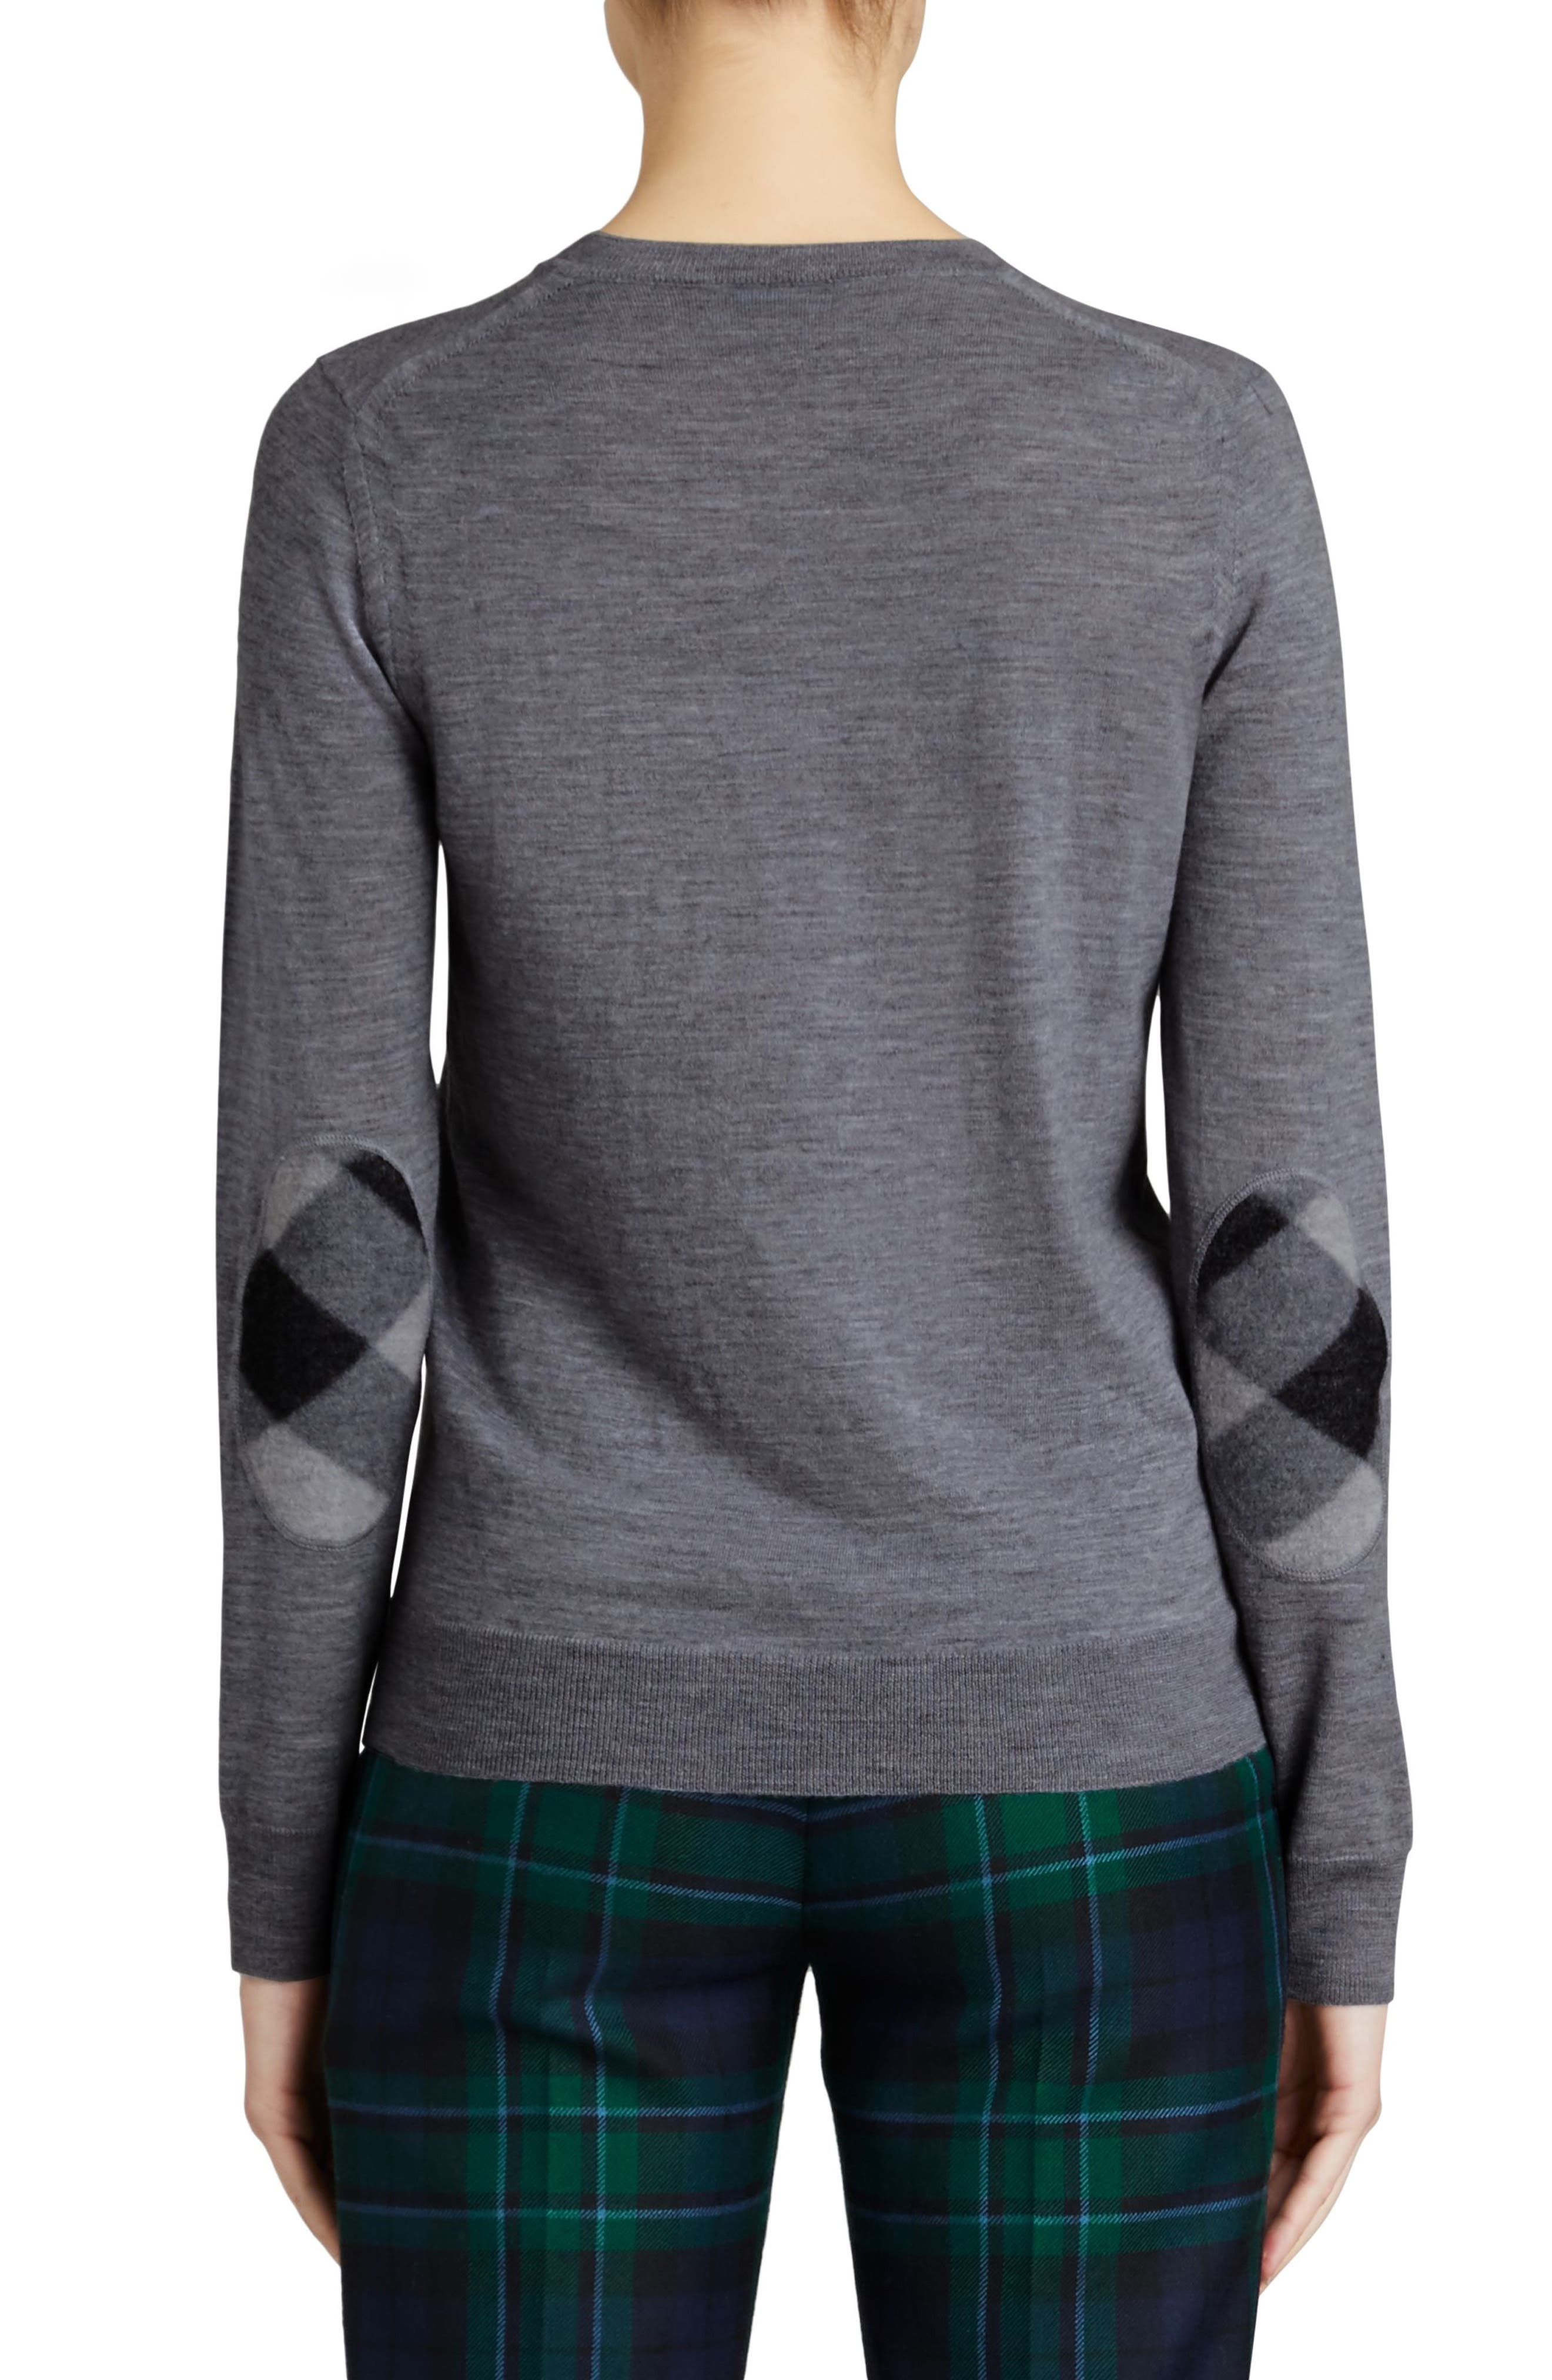 Viar Merino Wool Sweater,                             Alternate thumbnail 8, color,